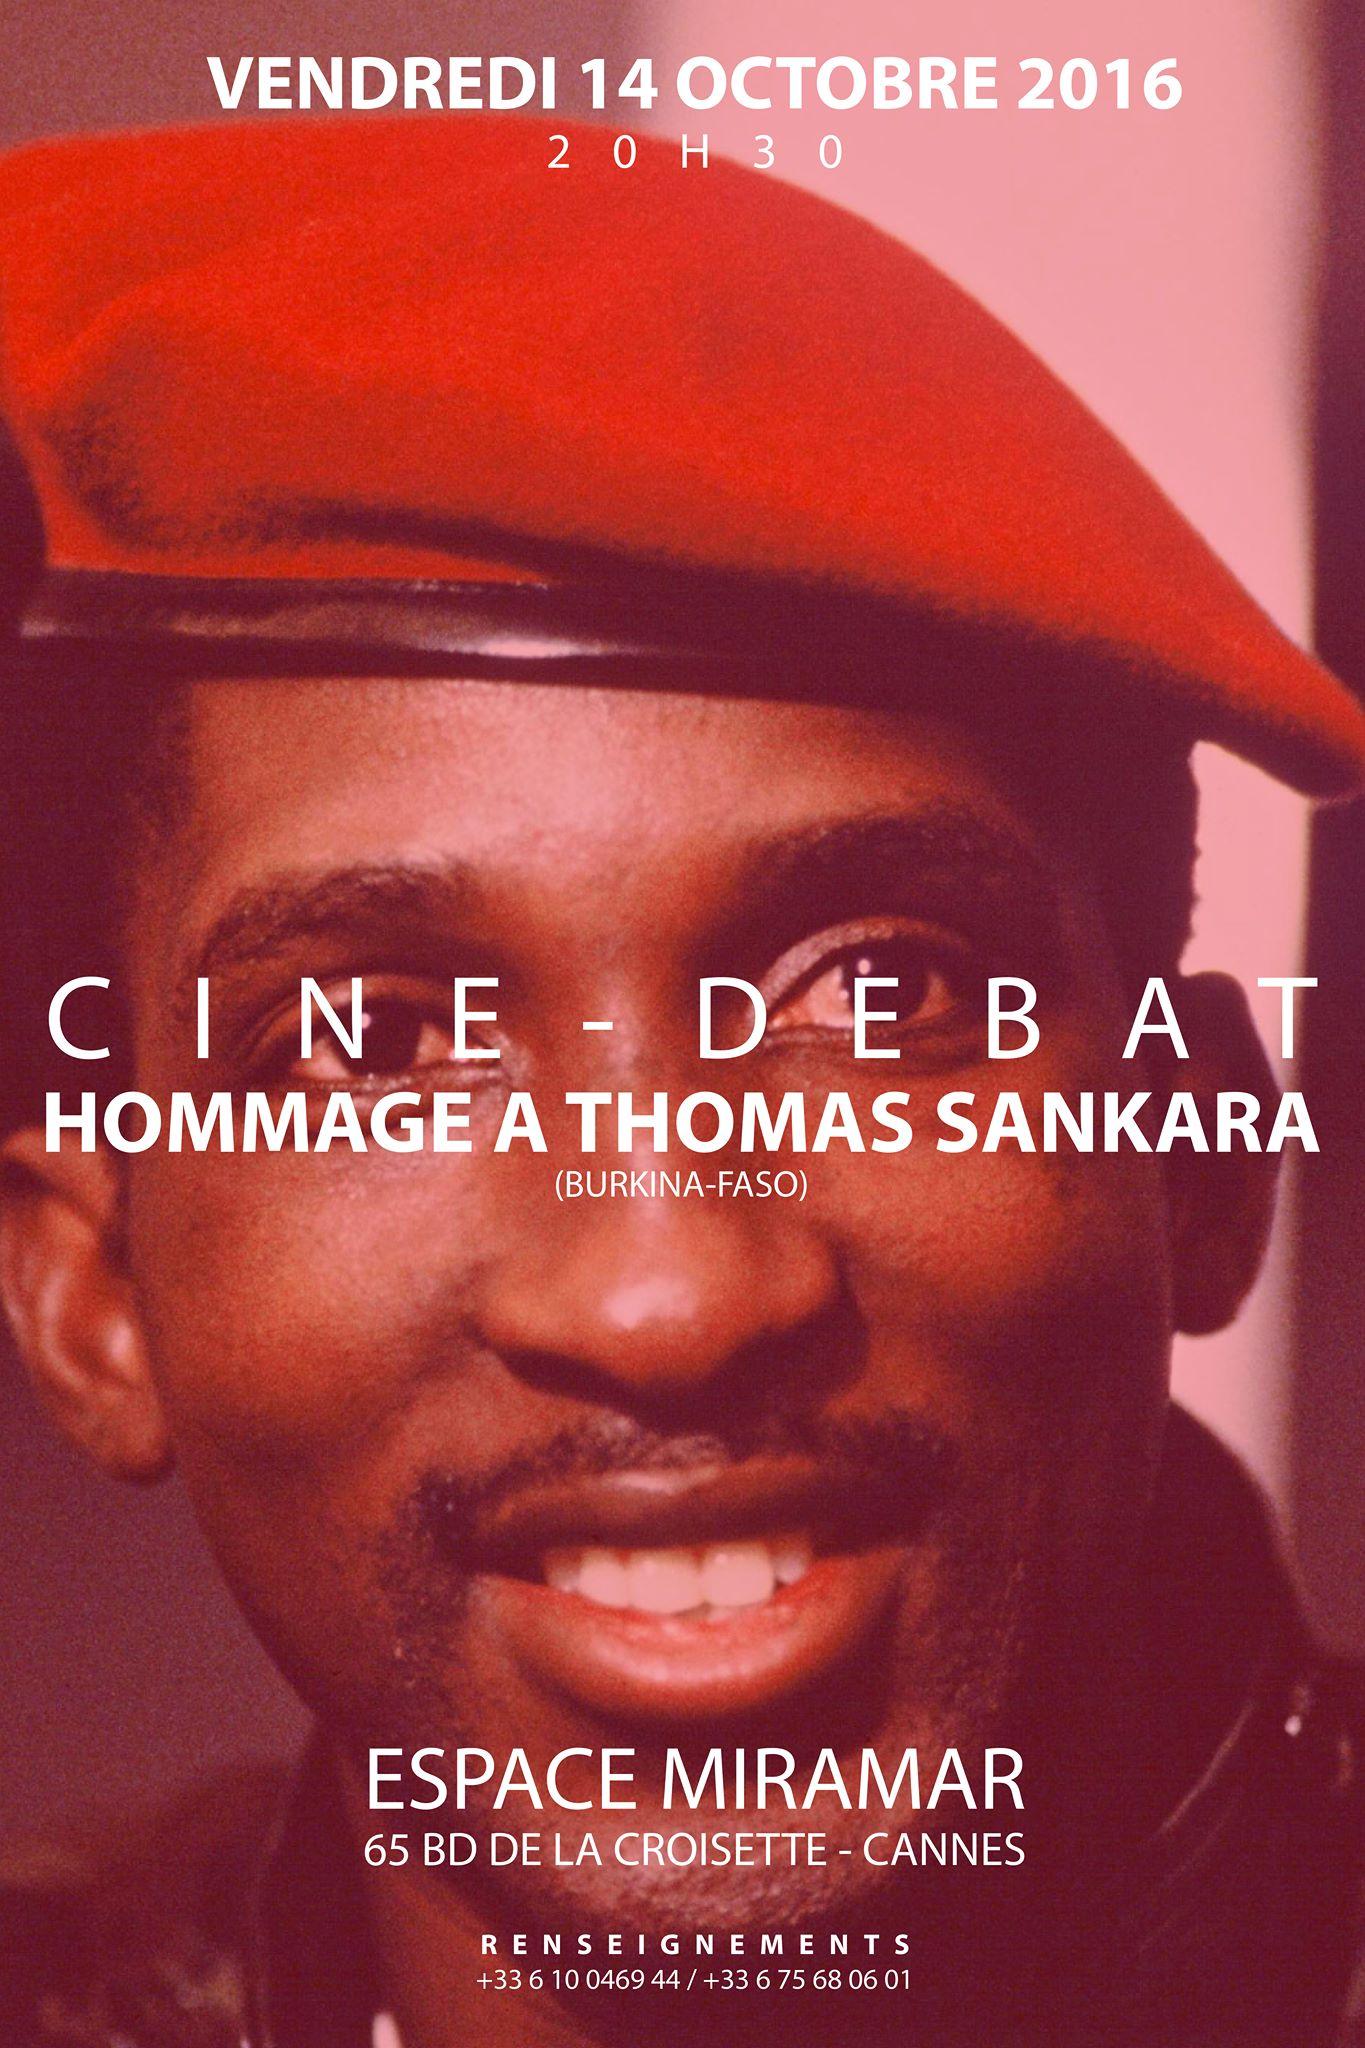 Hommage Thomas Sankara